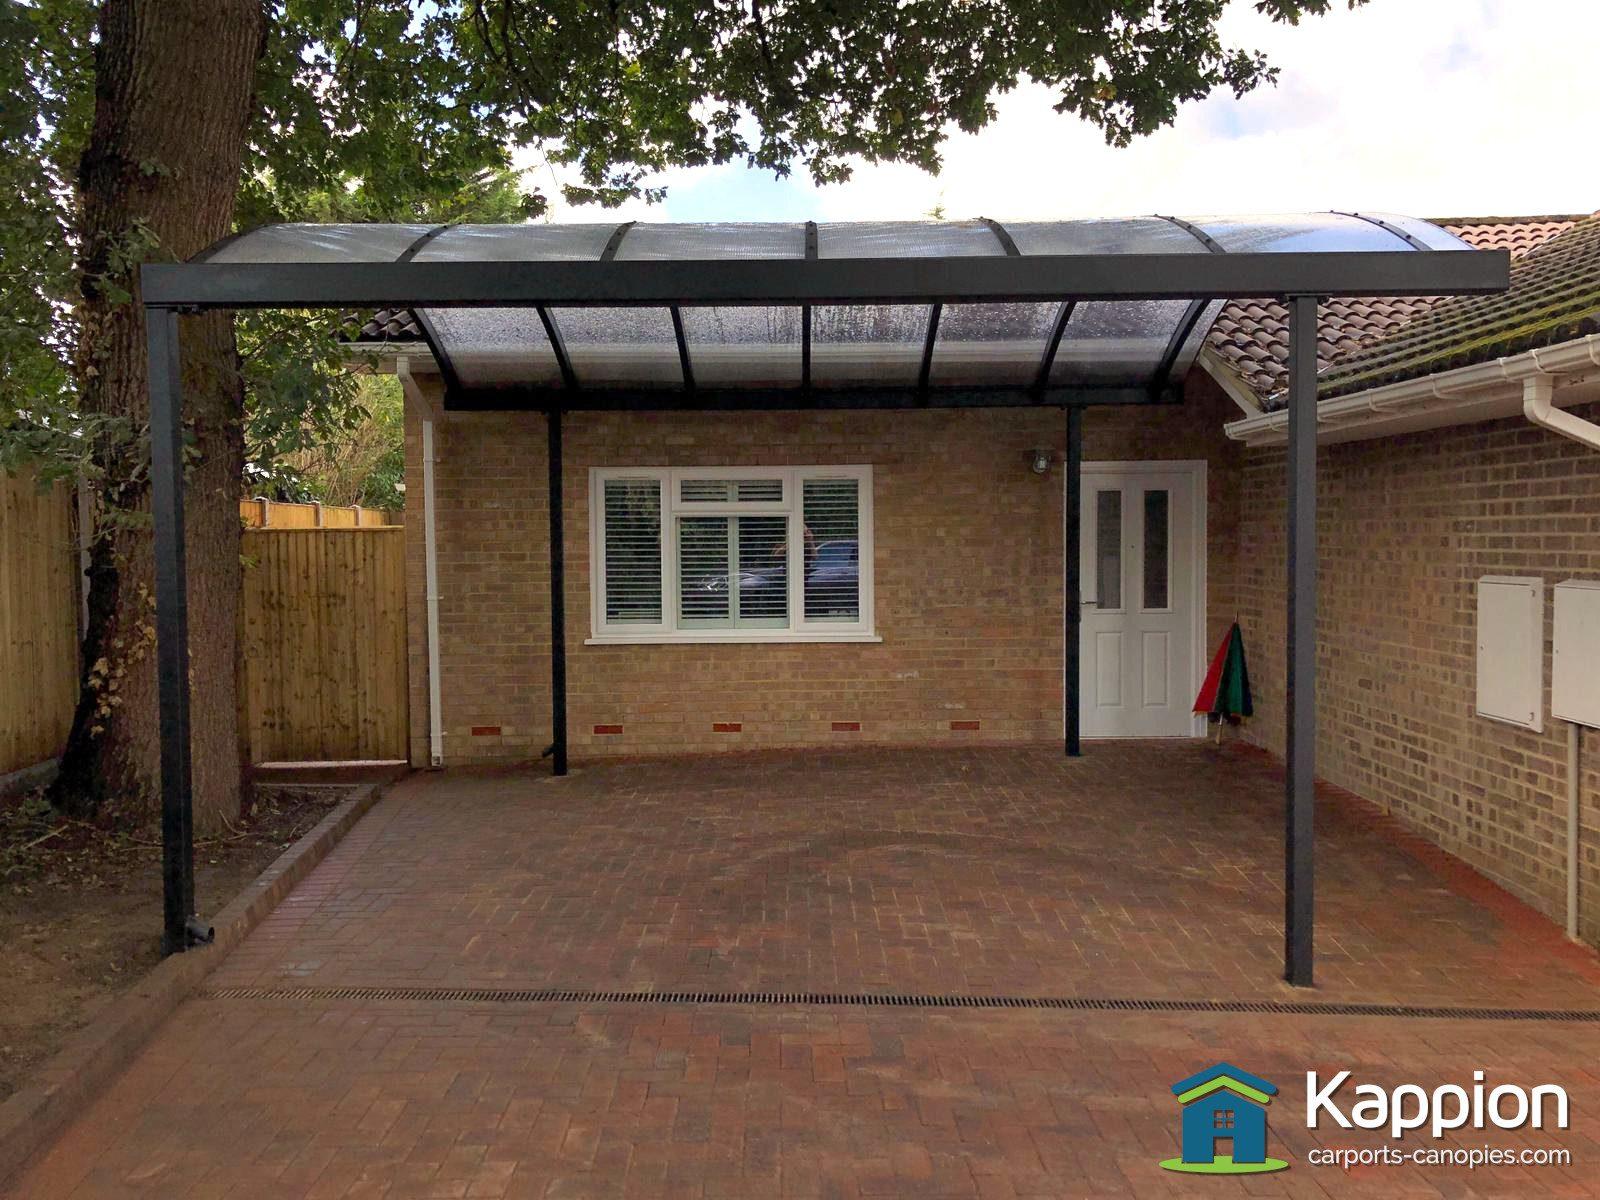 Enterance-Canopy-Carport-Karen-001